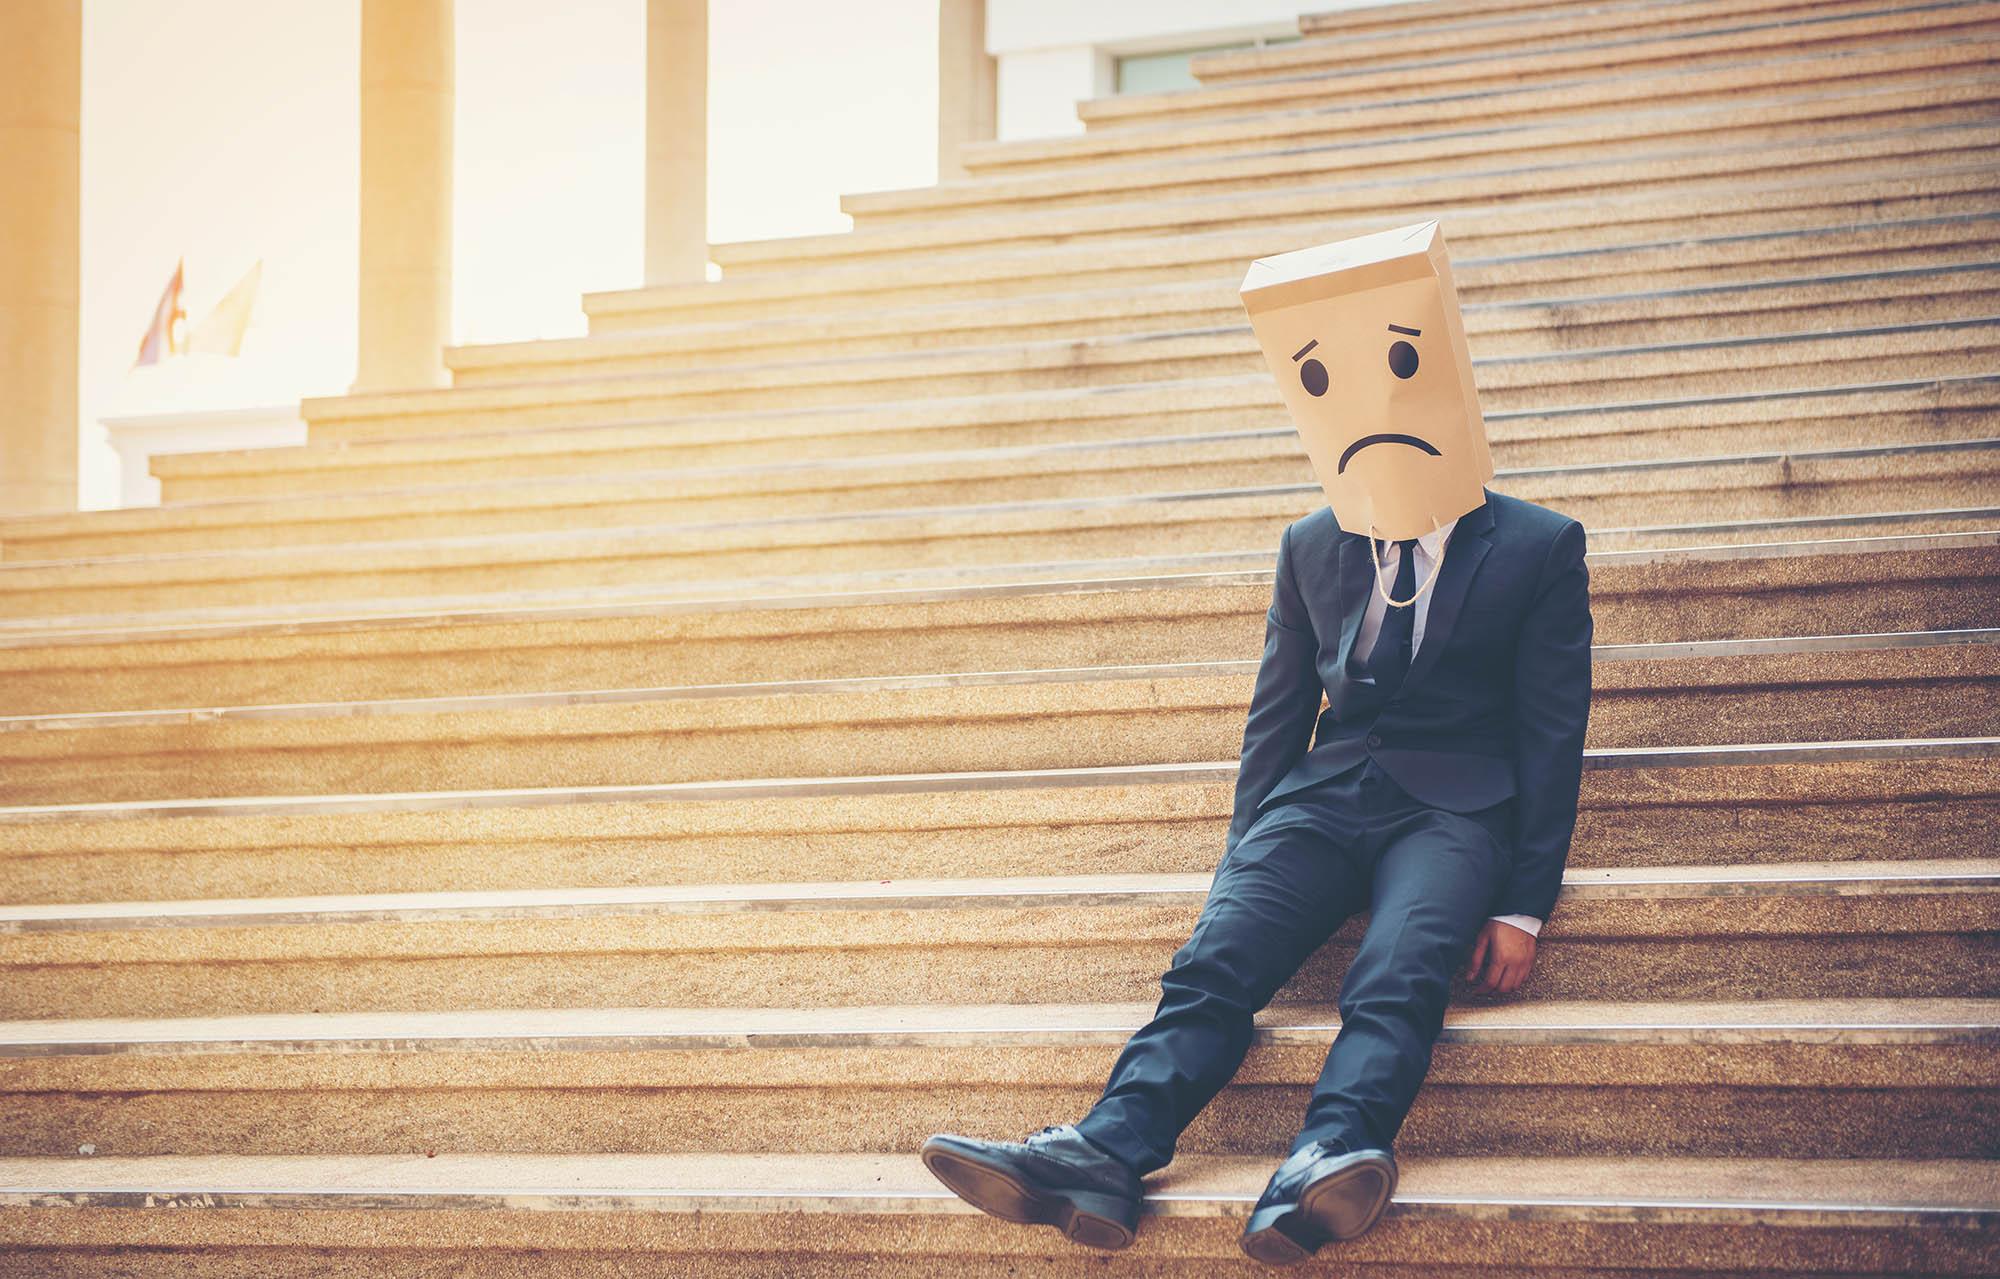 Sad face partial backlinks on social